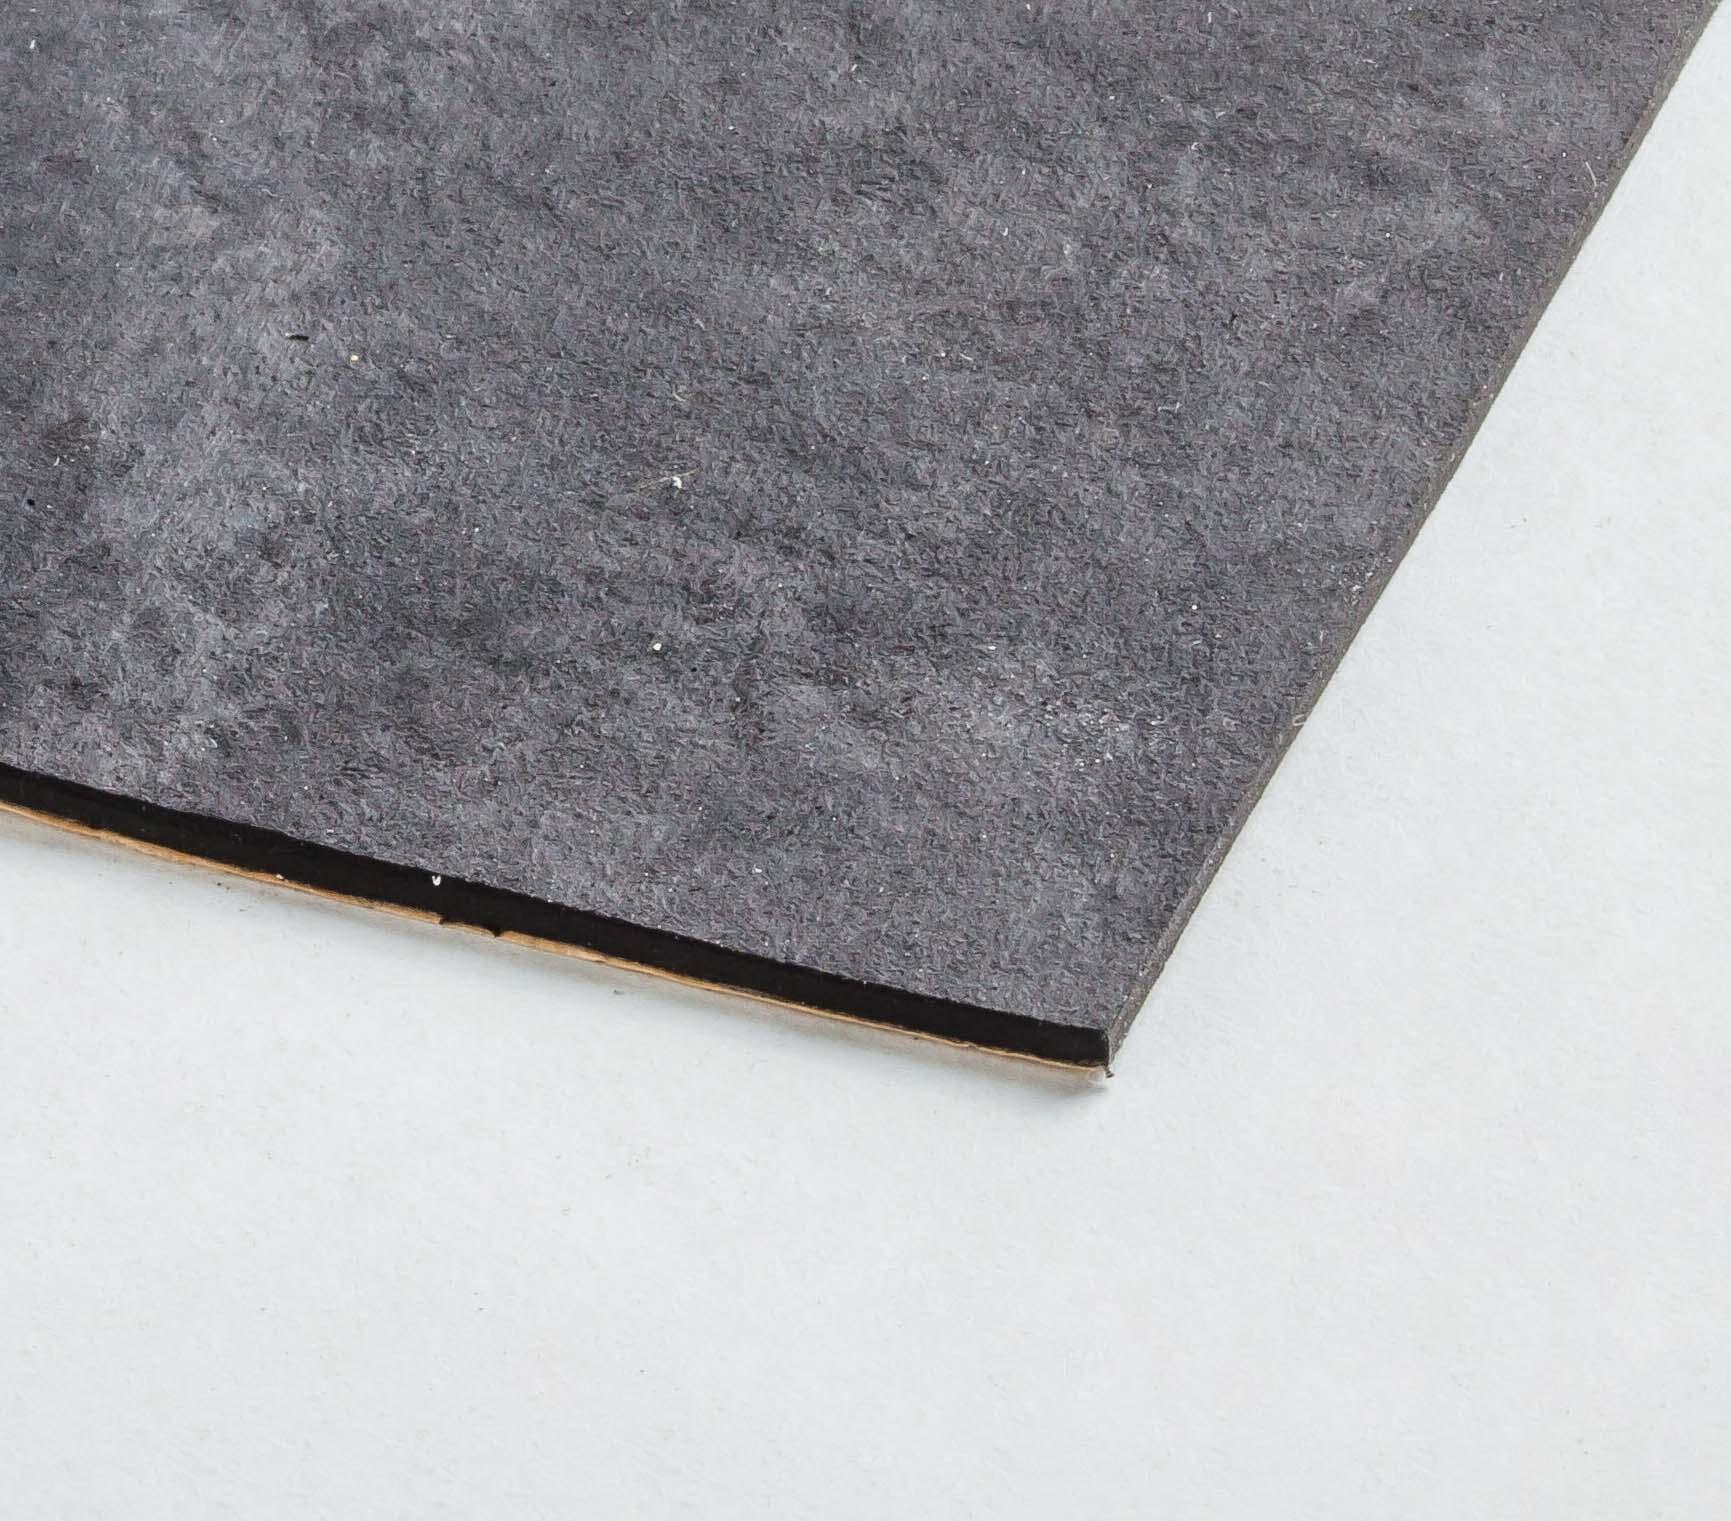 black mat audio dampening butyl product siless bulk automotive sound noise deadening car deadener and sqft material insulation